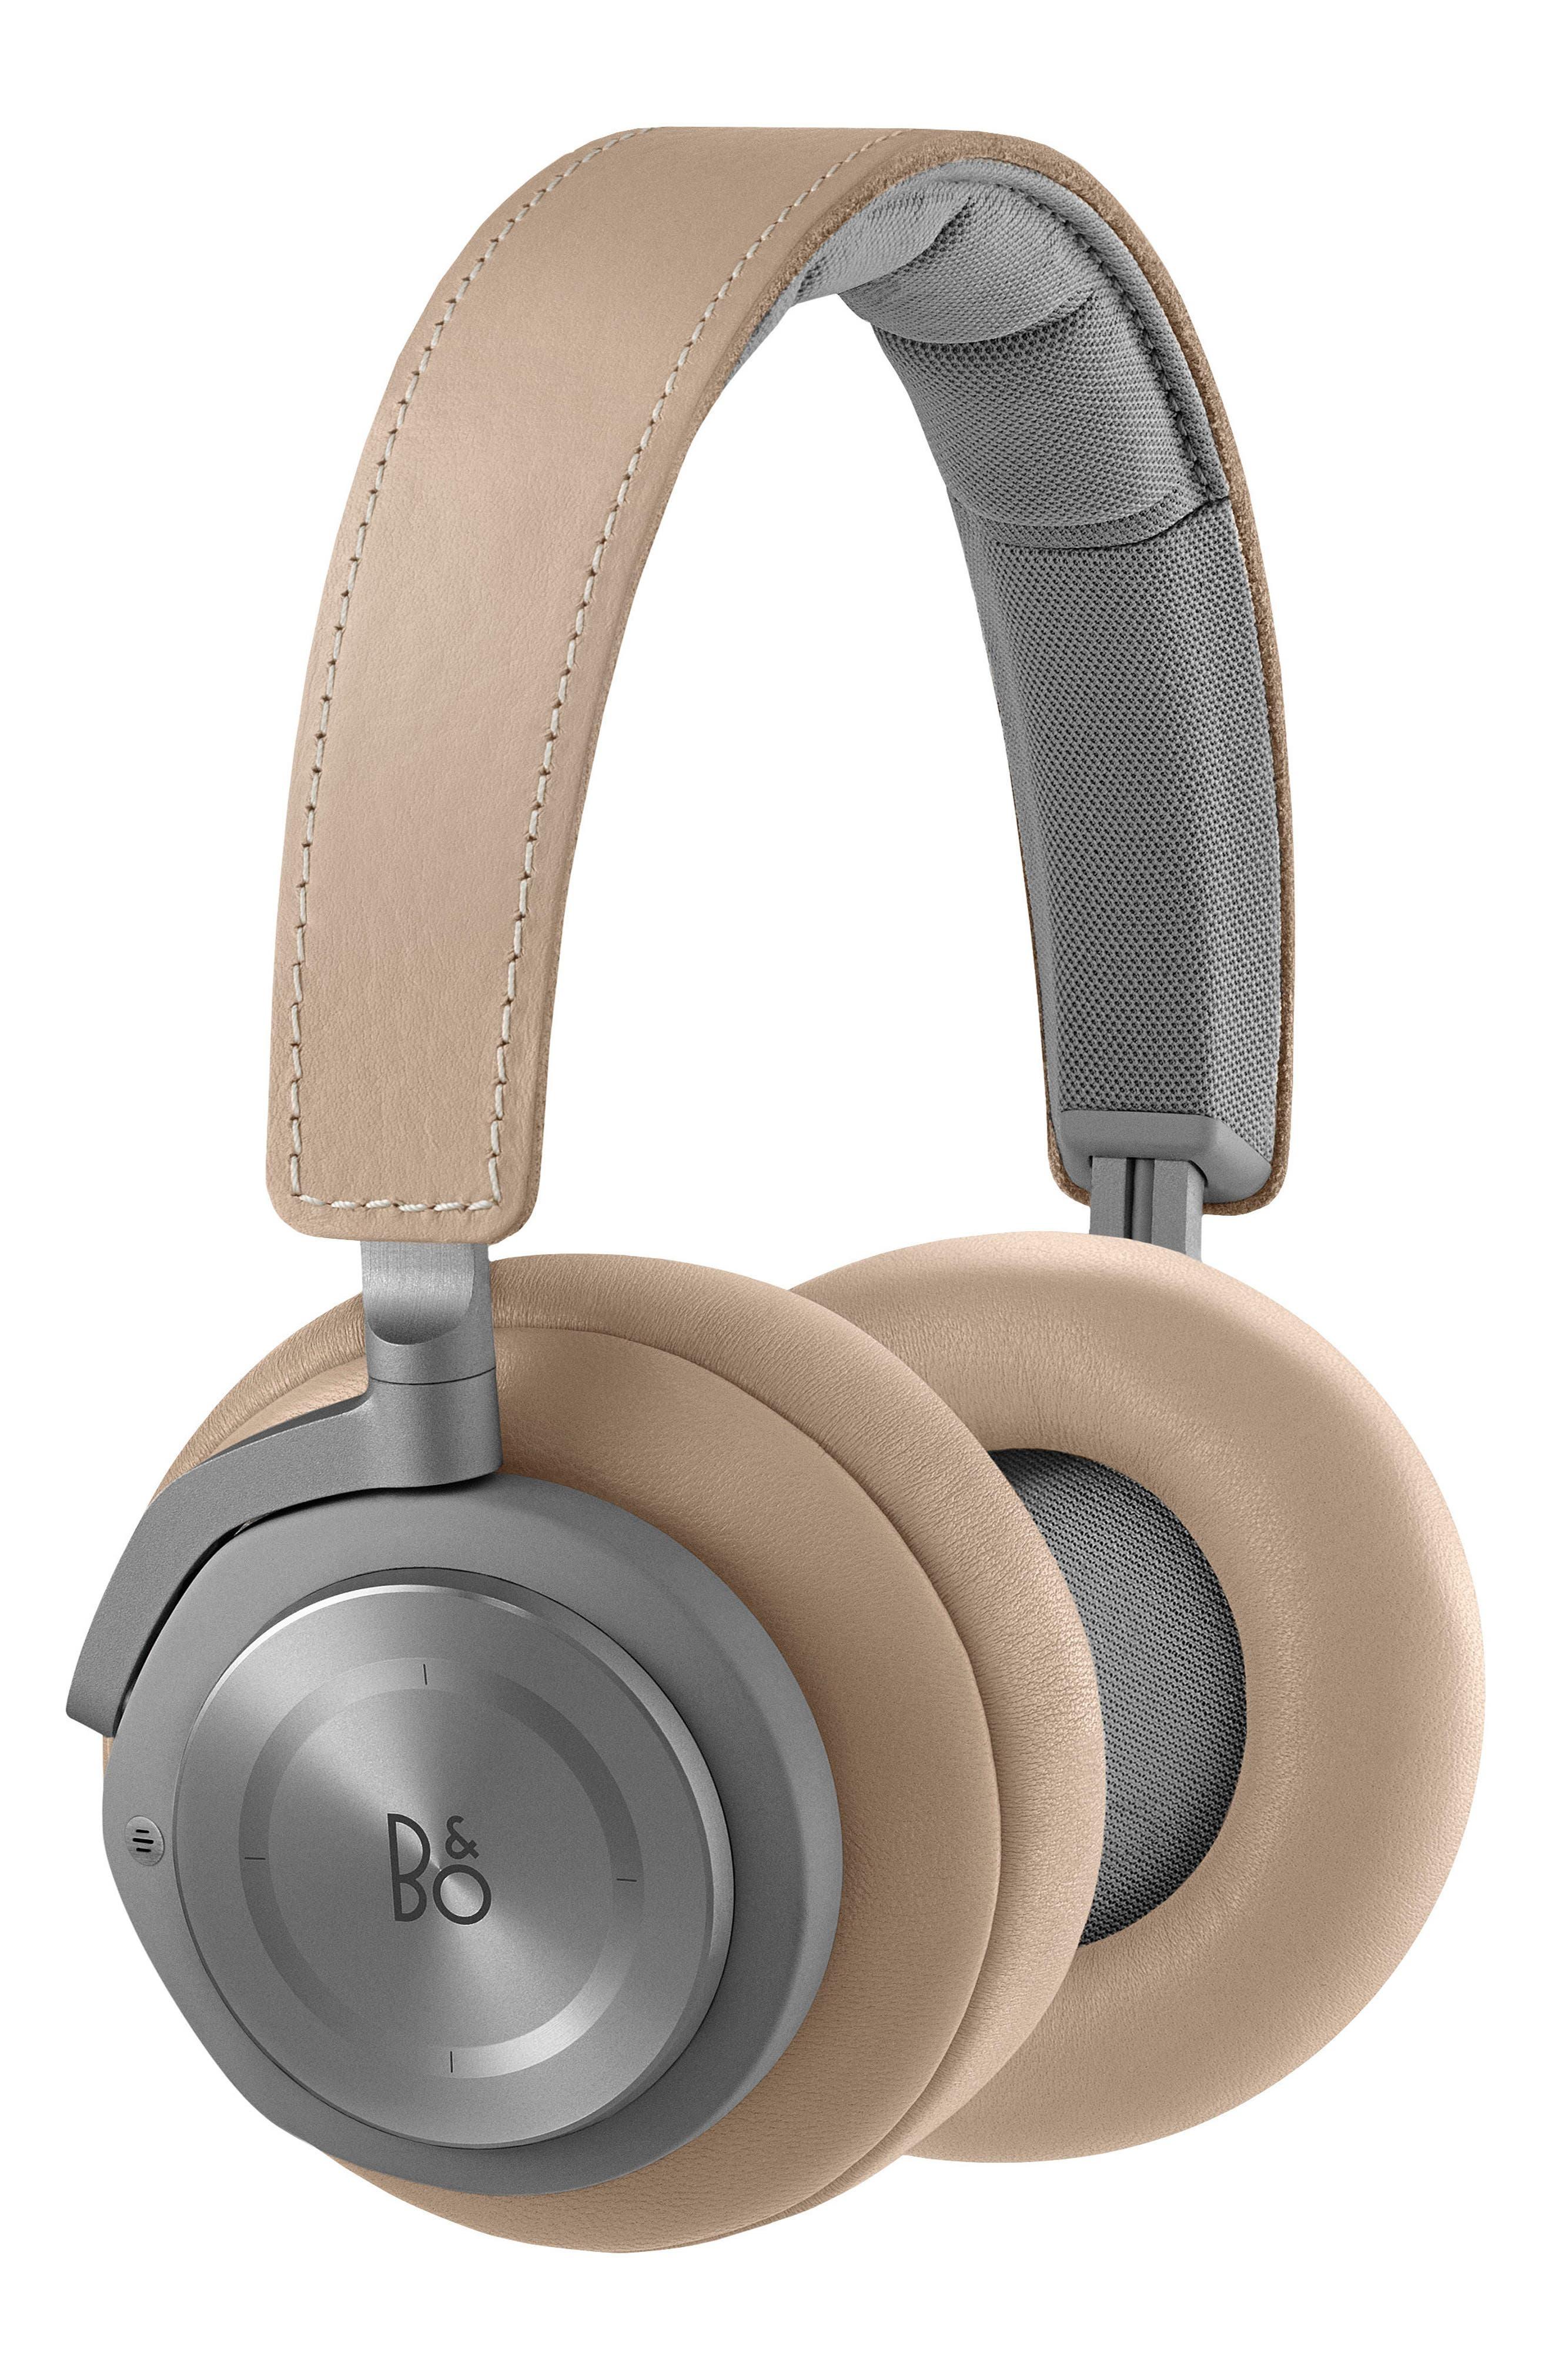 B&O Play H9 Wireless Noise Canceling on-Ear Headphones